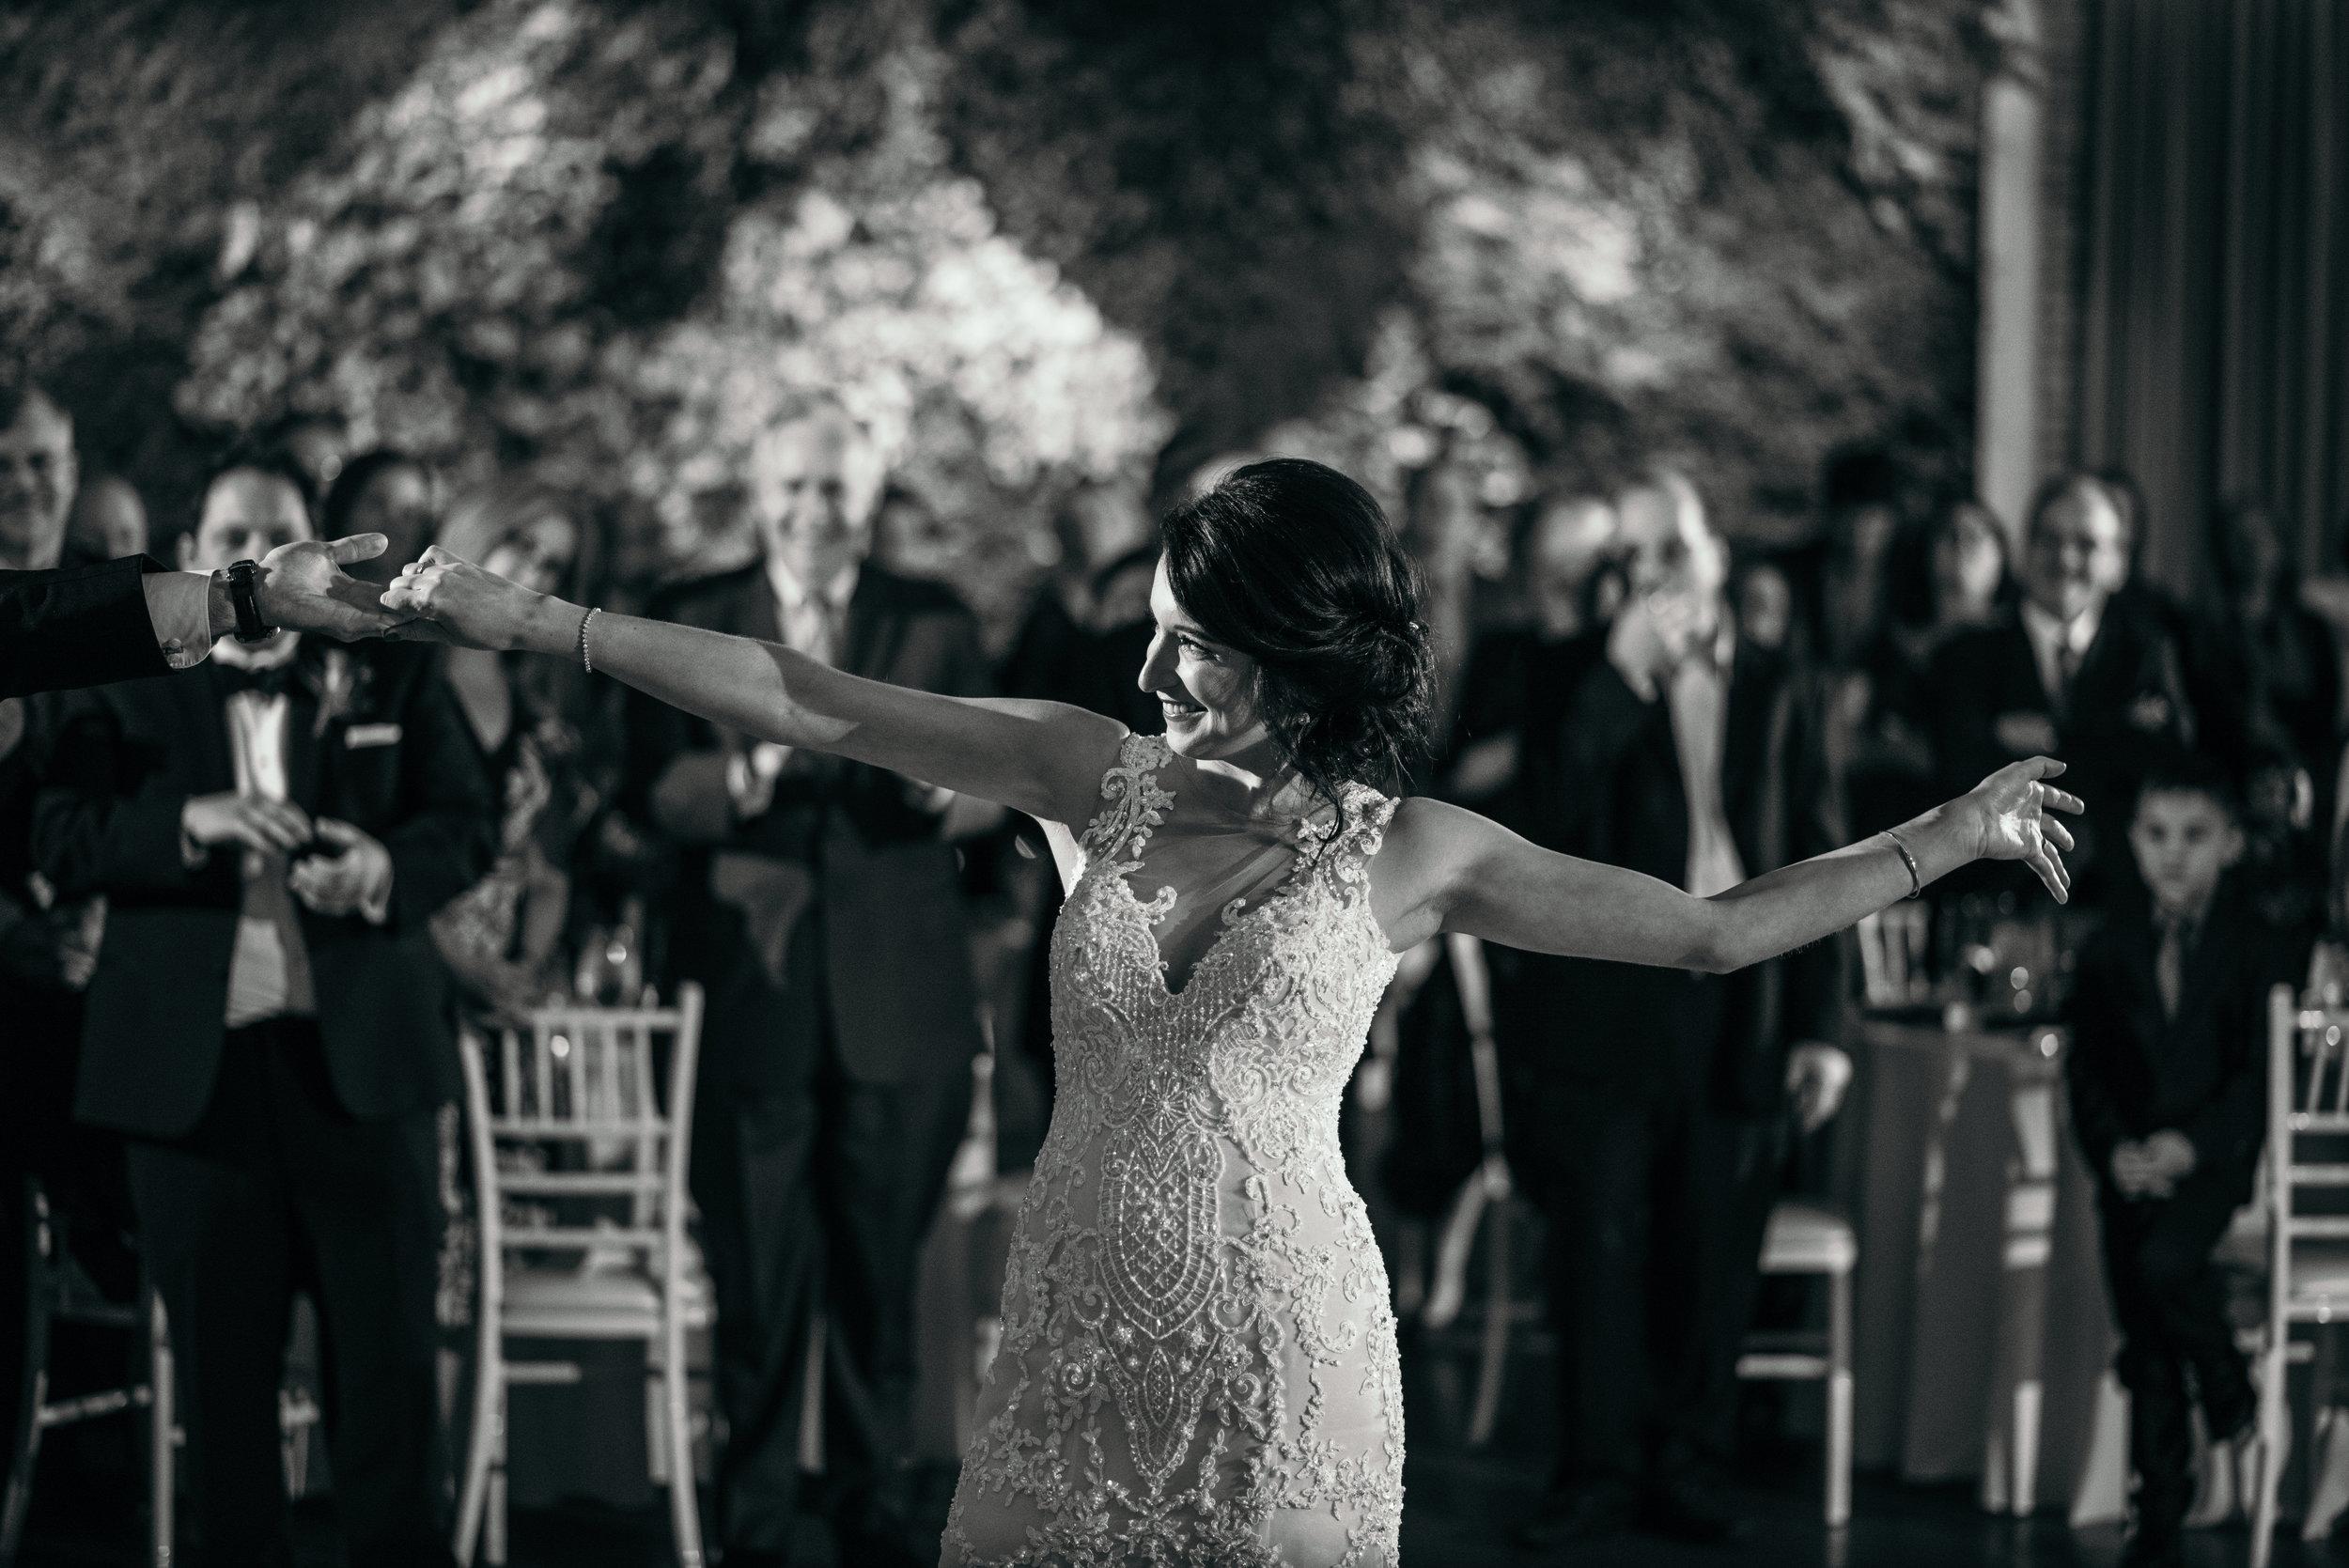 WeddingPhotos | NJPhotographer | Highlights-17-6.jpg